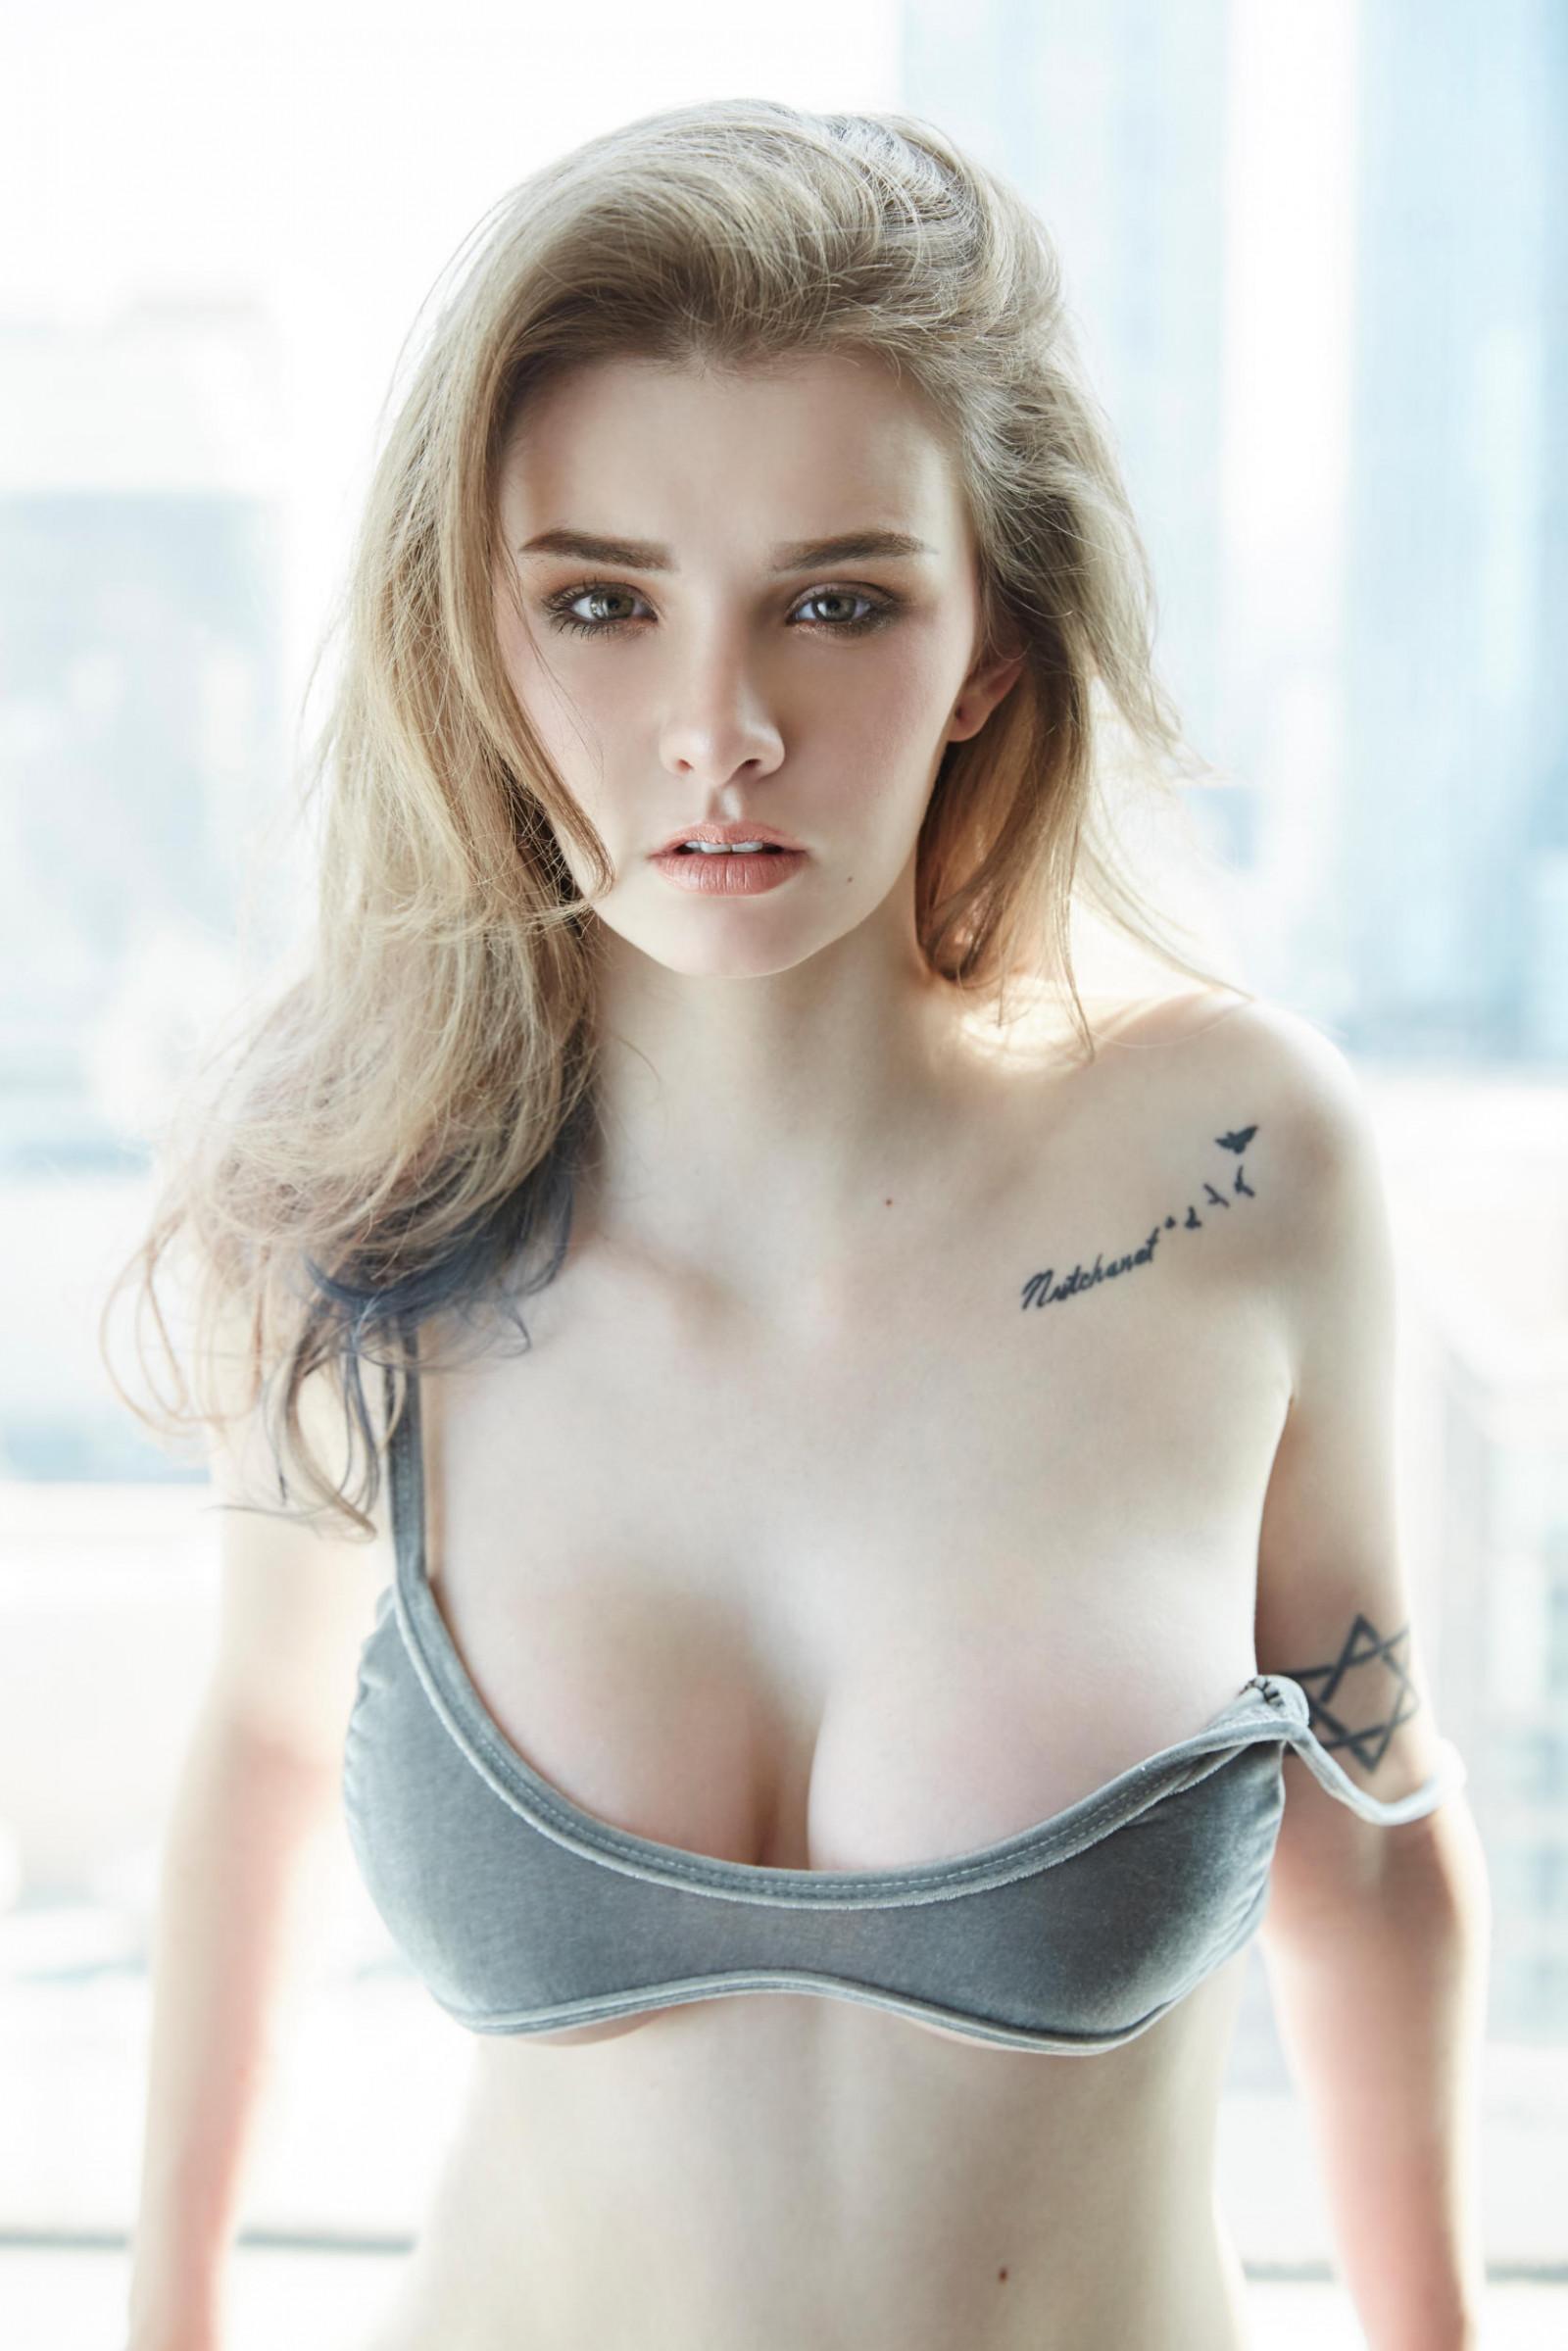 Wallpaper  Jessie Vard, Natural Boobs, White Skin, Women, Mussed Hair, Pale, Cleavage, Big Boobs, Blonde, Model, Looking At Viewer, Tattoo -9634